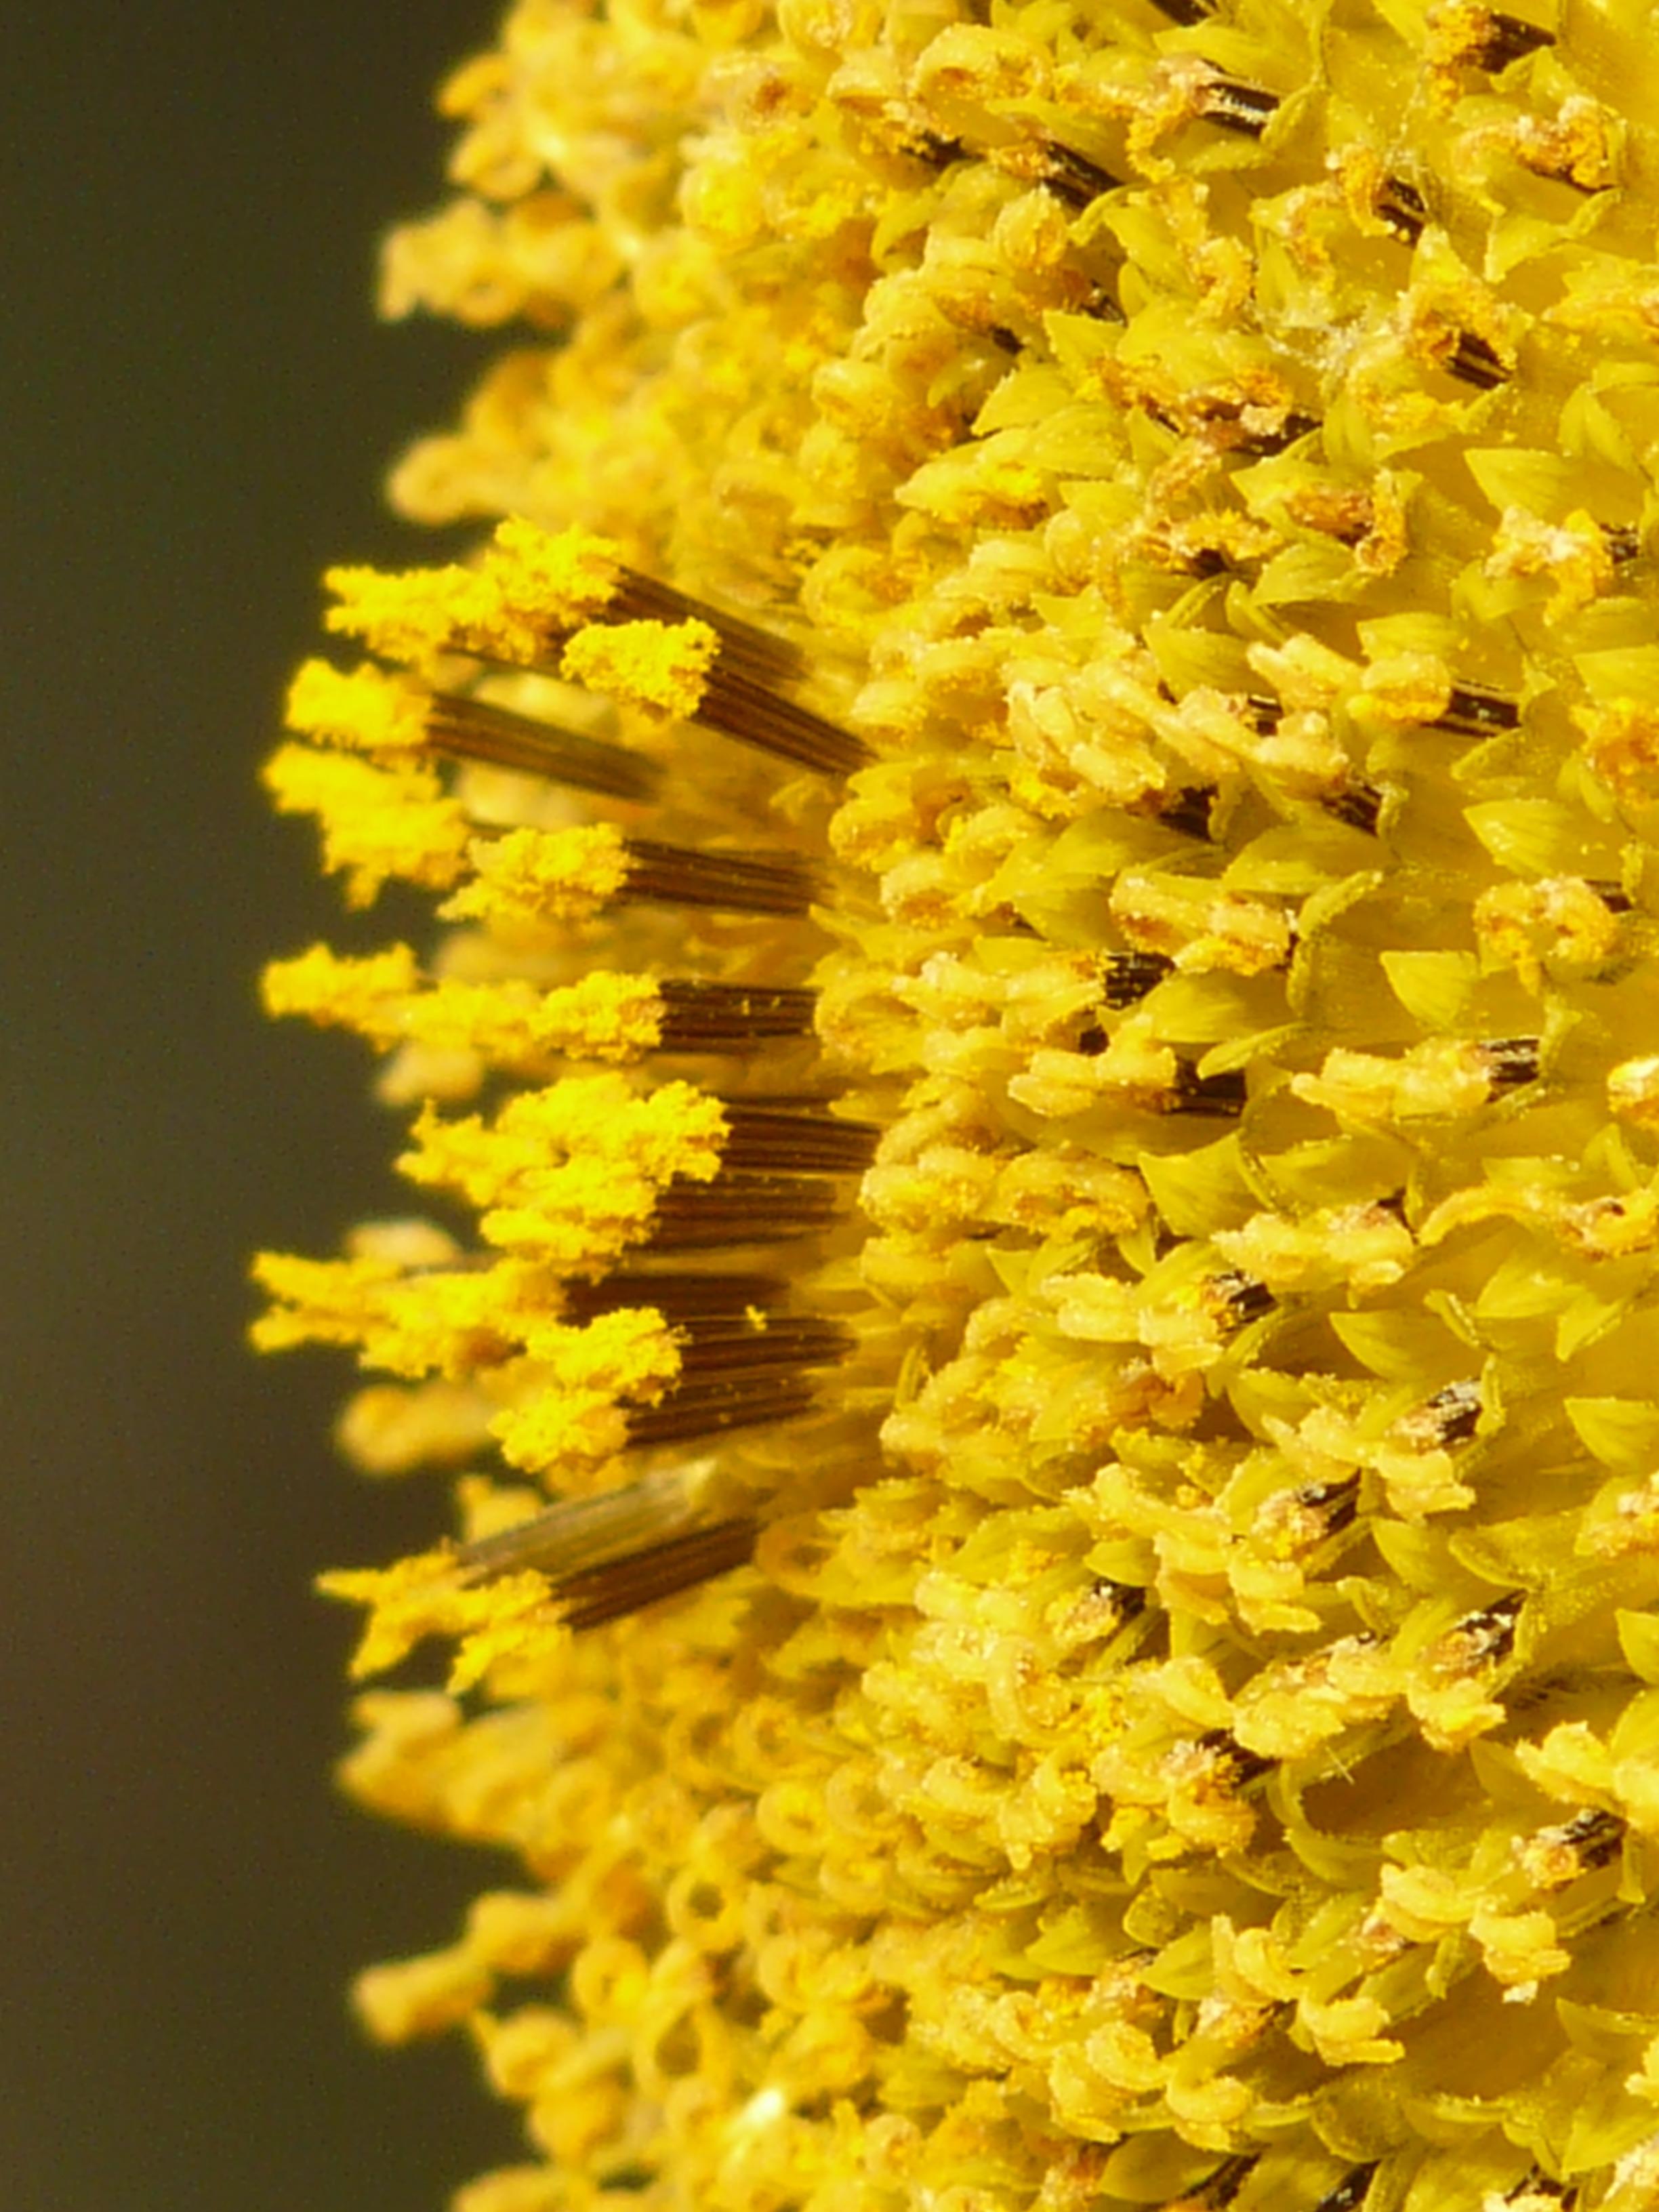 Inflorescence of yellow tubular flowers free image inflorescence of yellow tubular flowers mightylinksfo